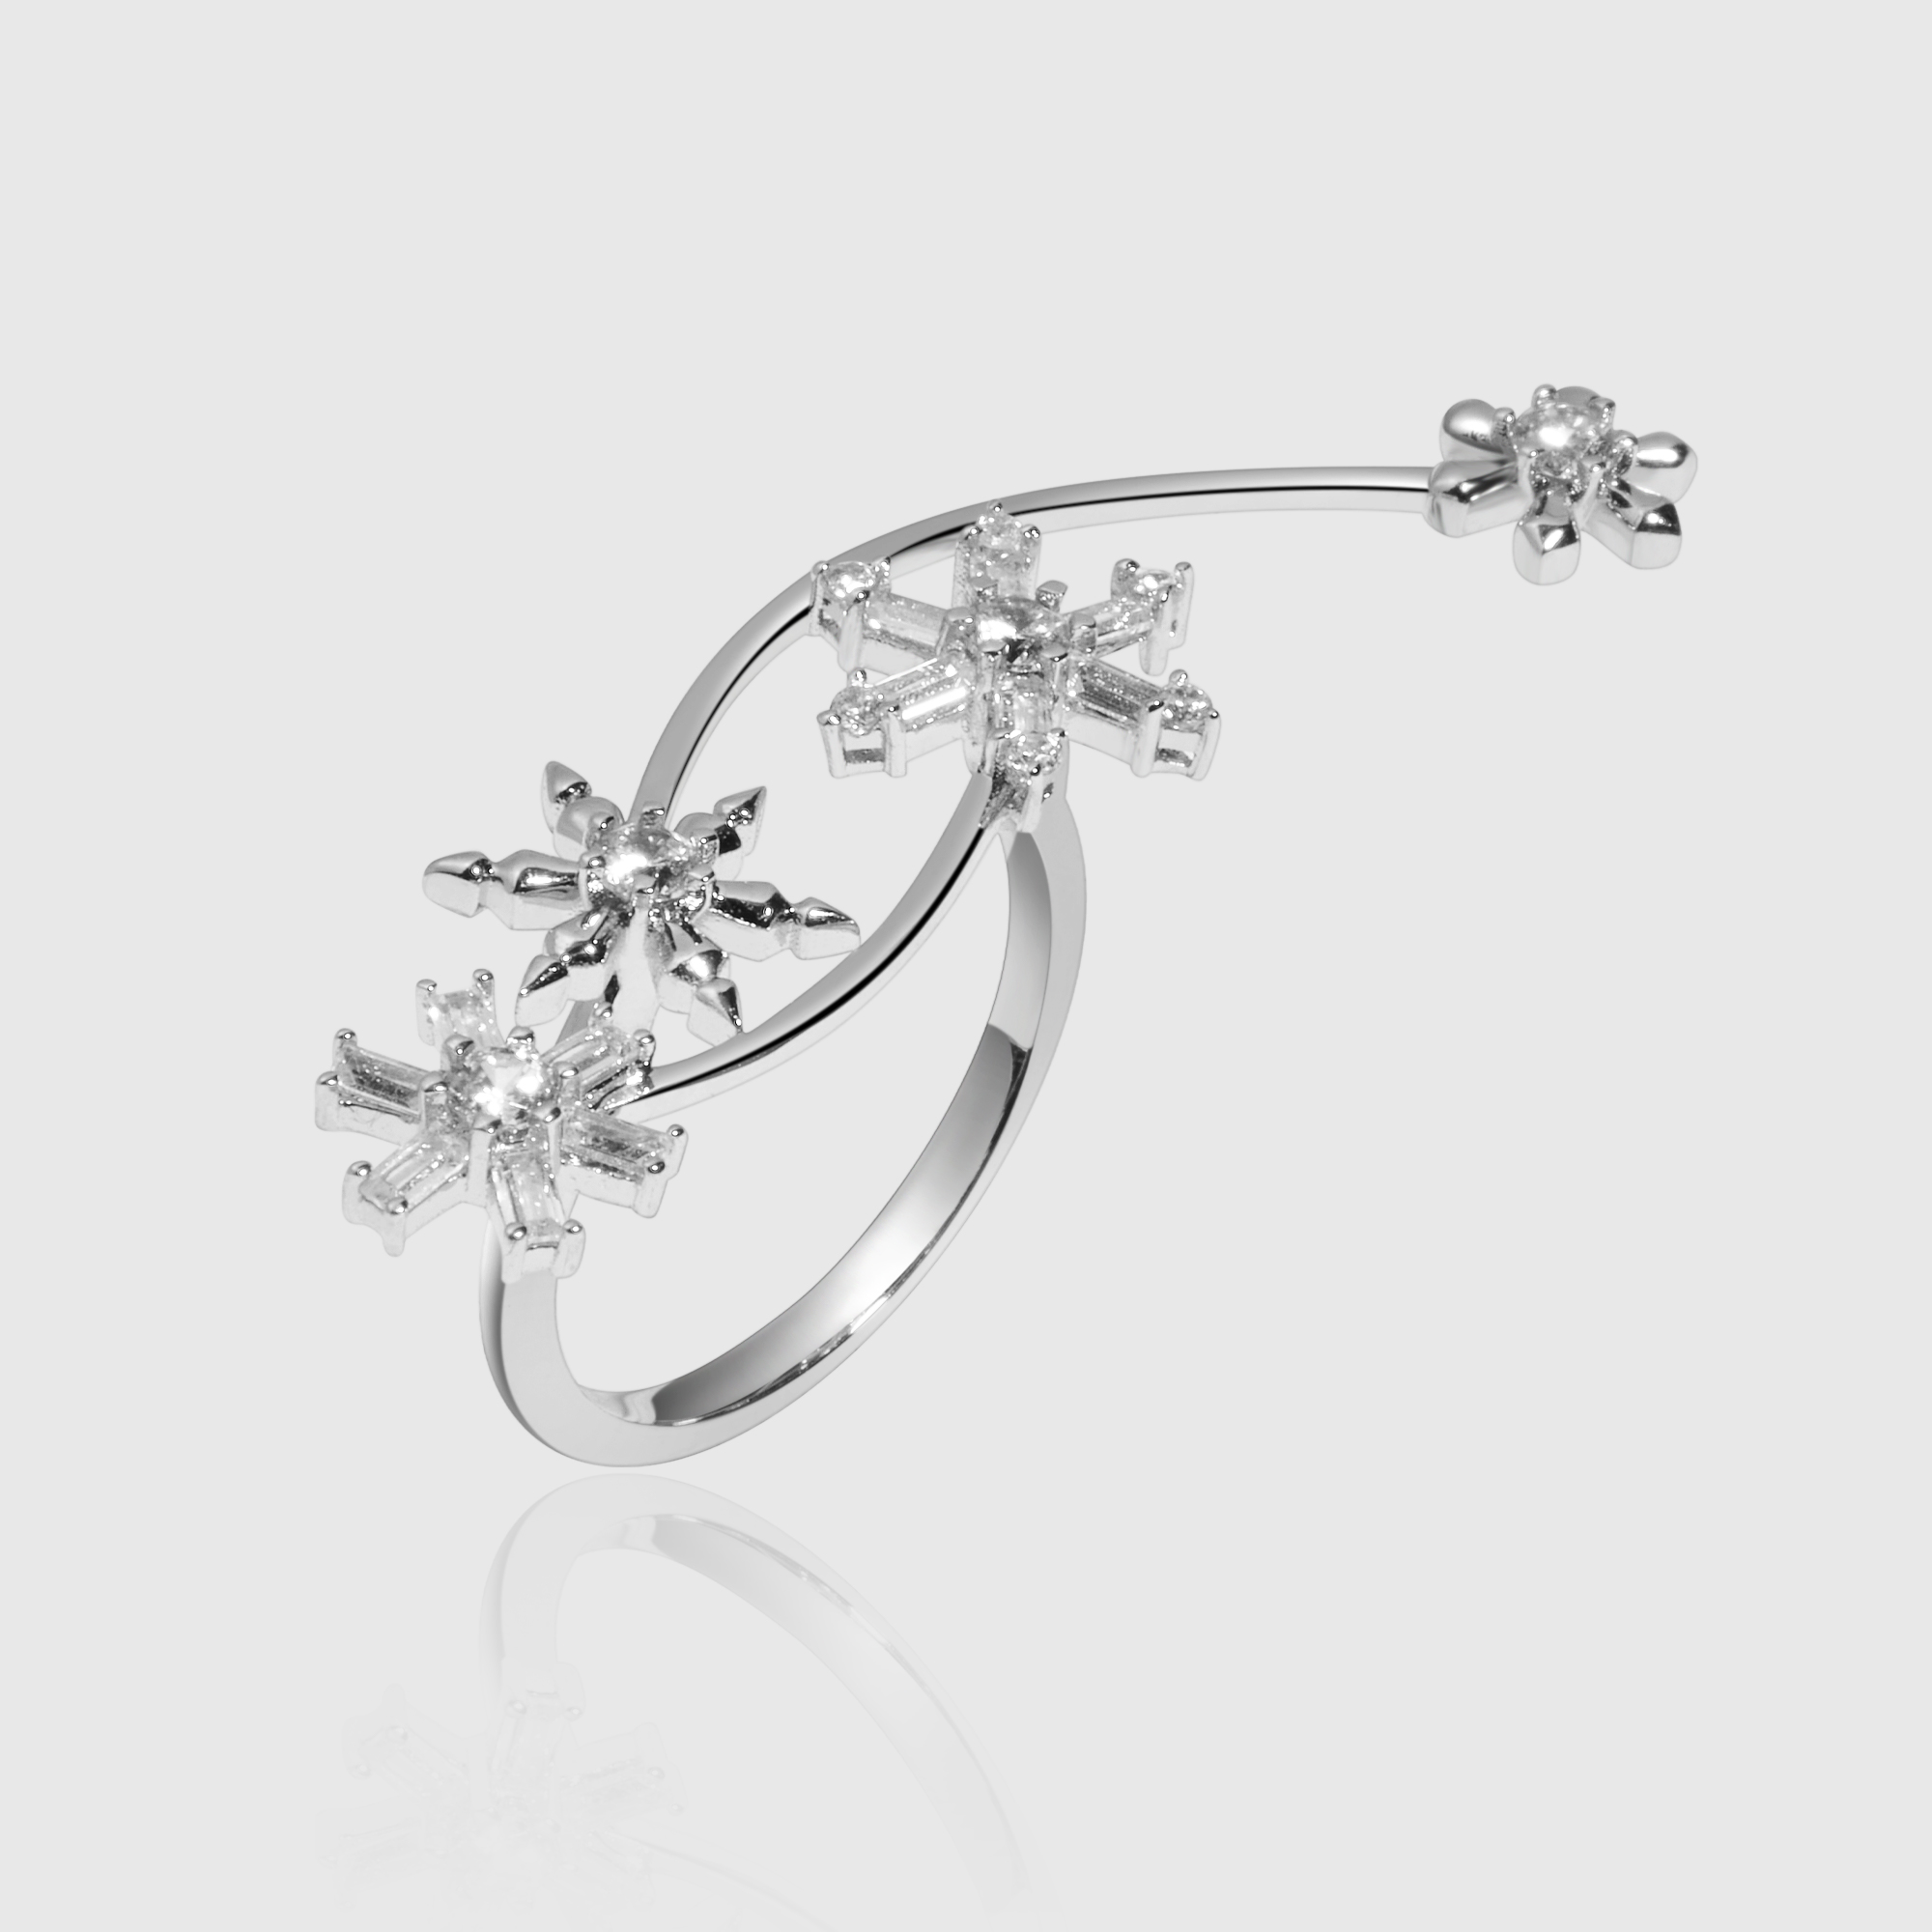 MEDEAR 雪花系列18k白金镶嵌钻石 雪花戒指